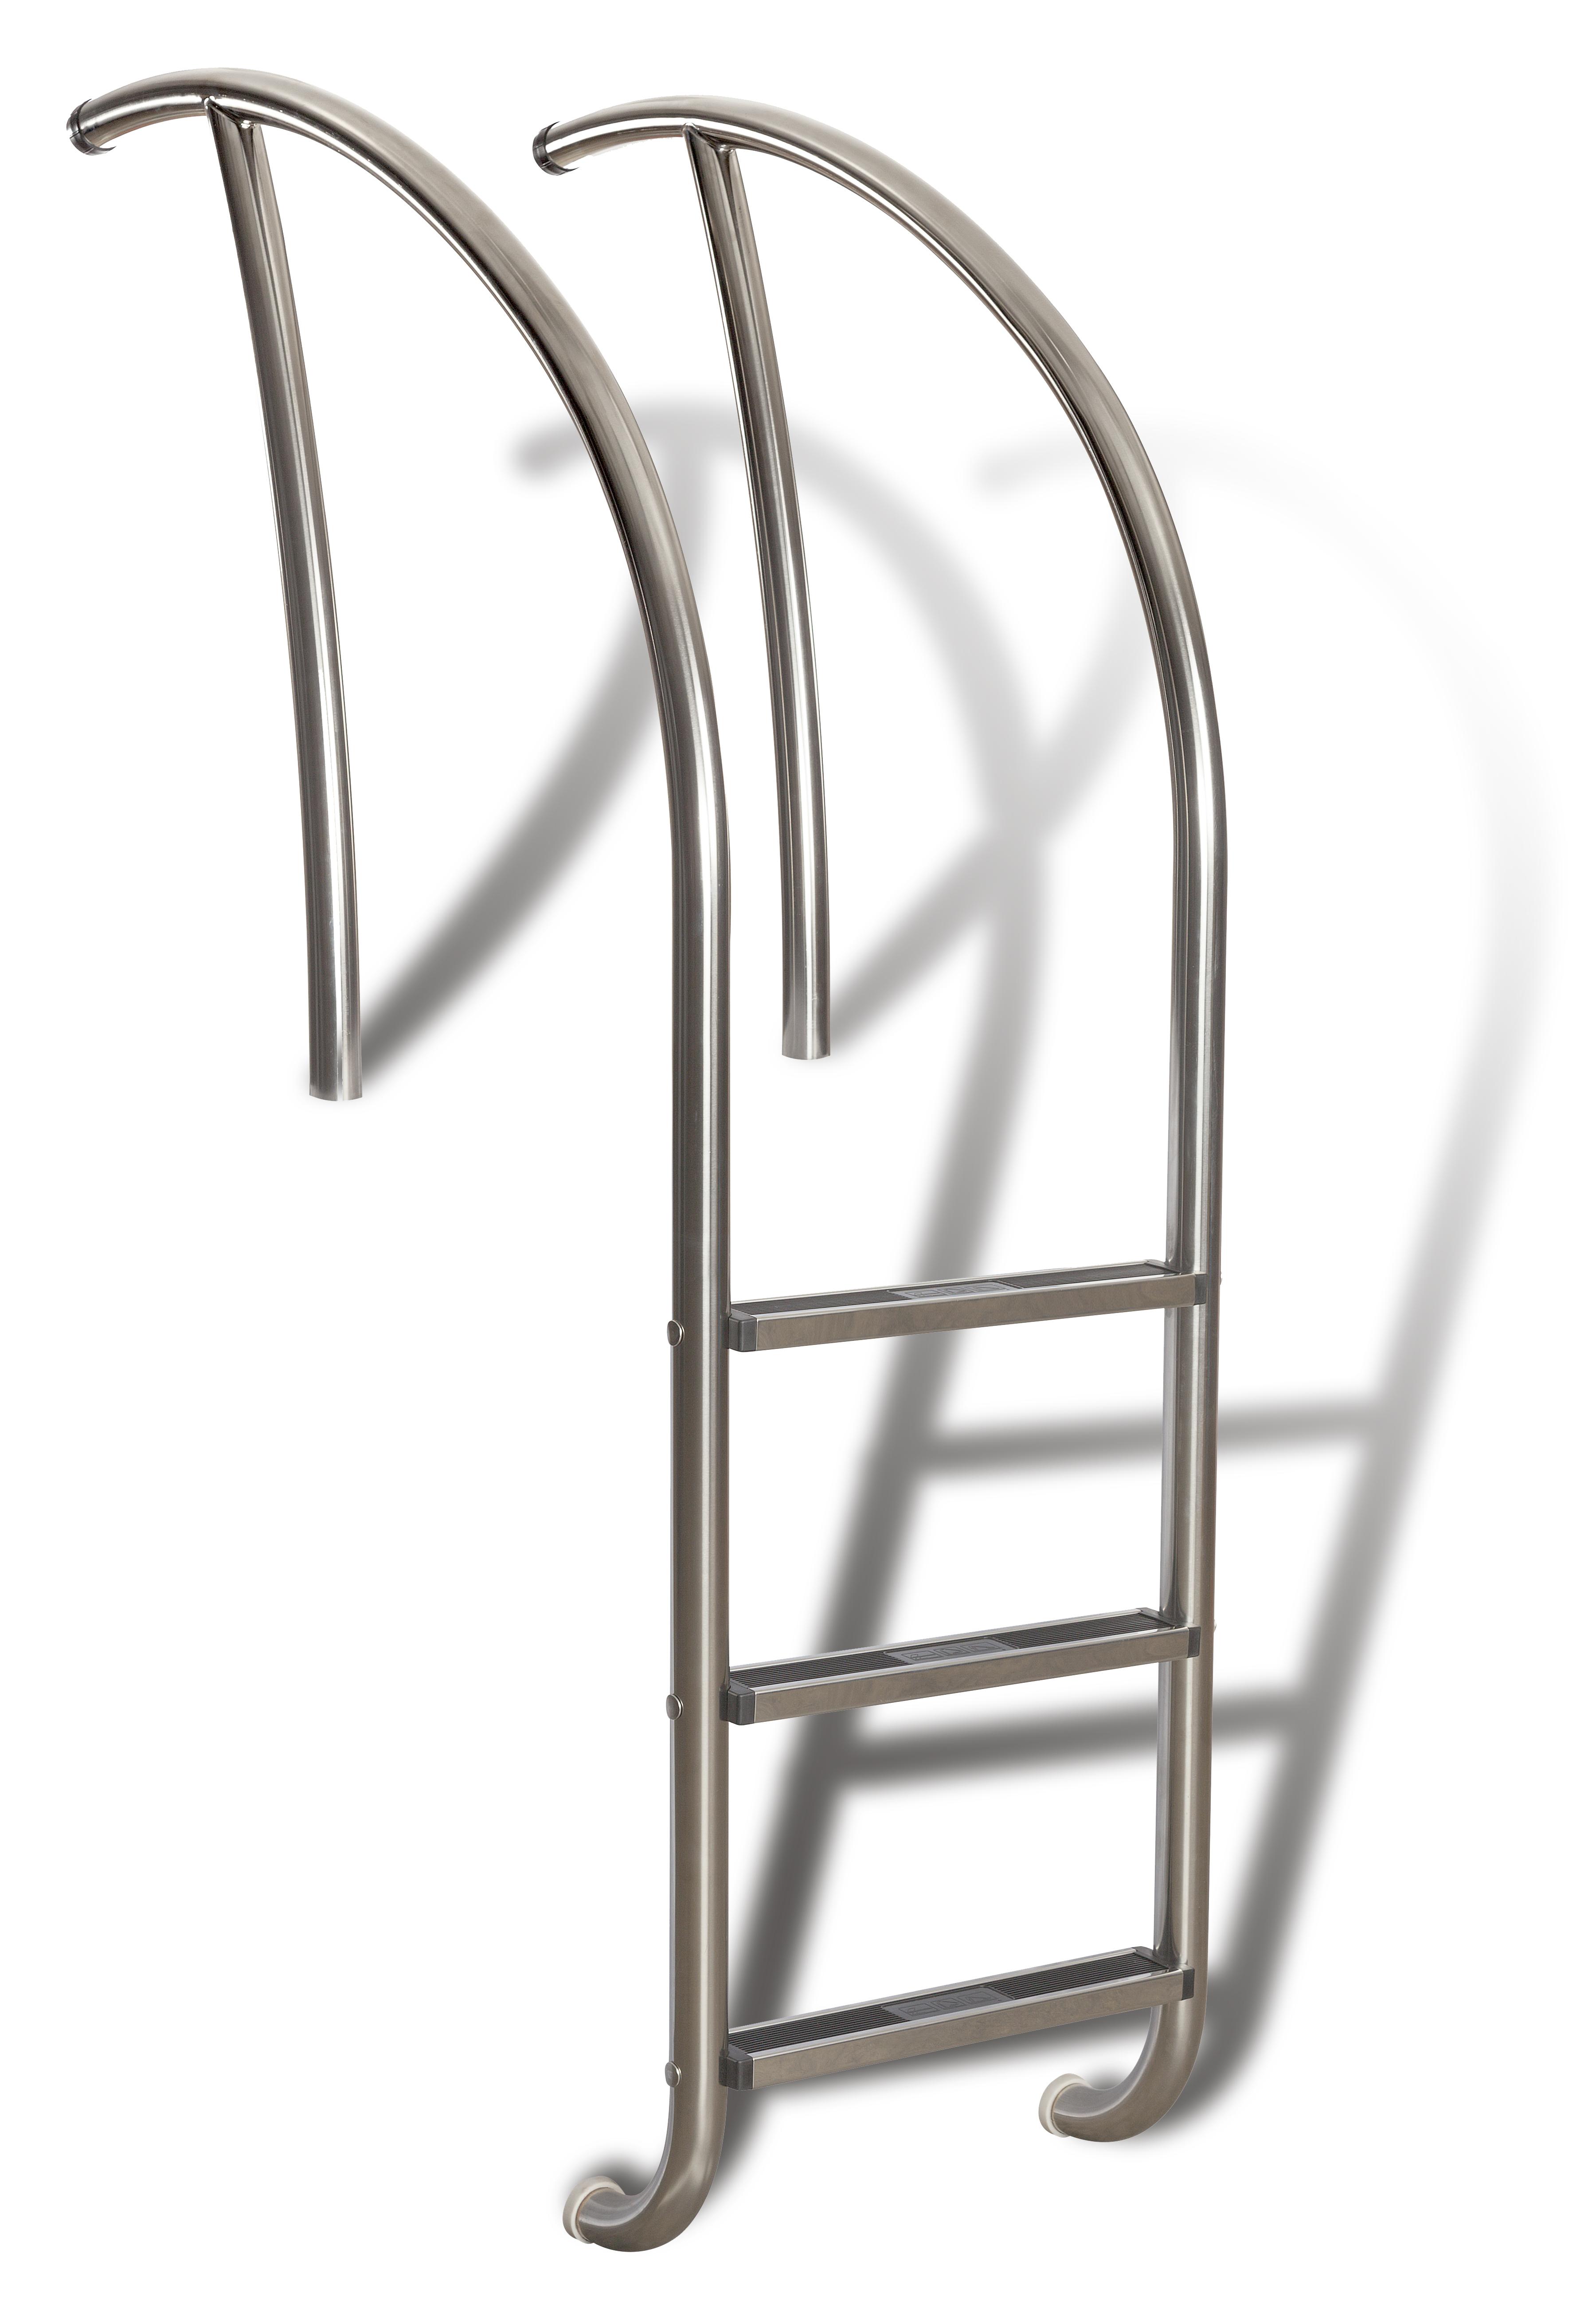 Artisan Series Ladder Model ART 1003 By SrSmith